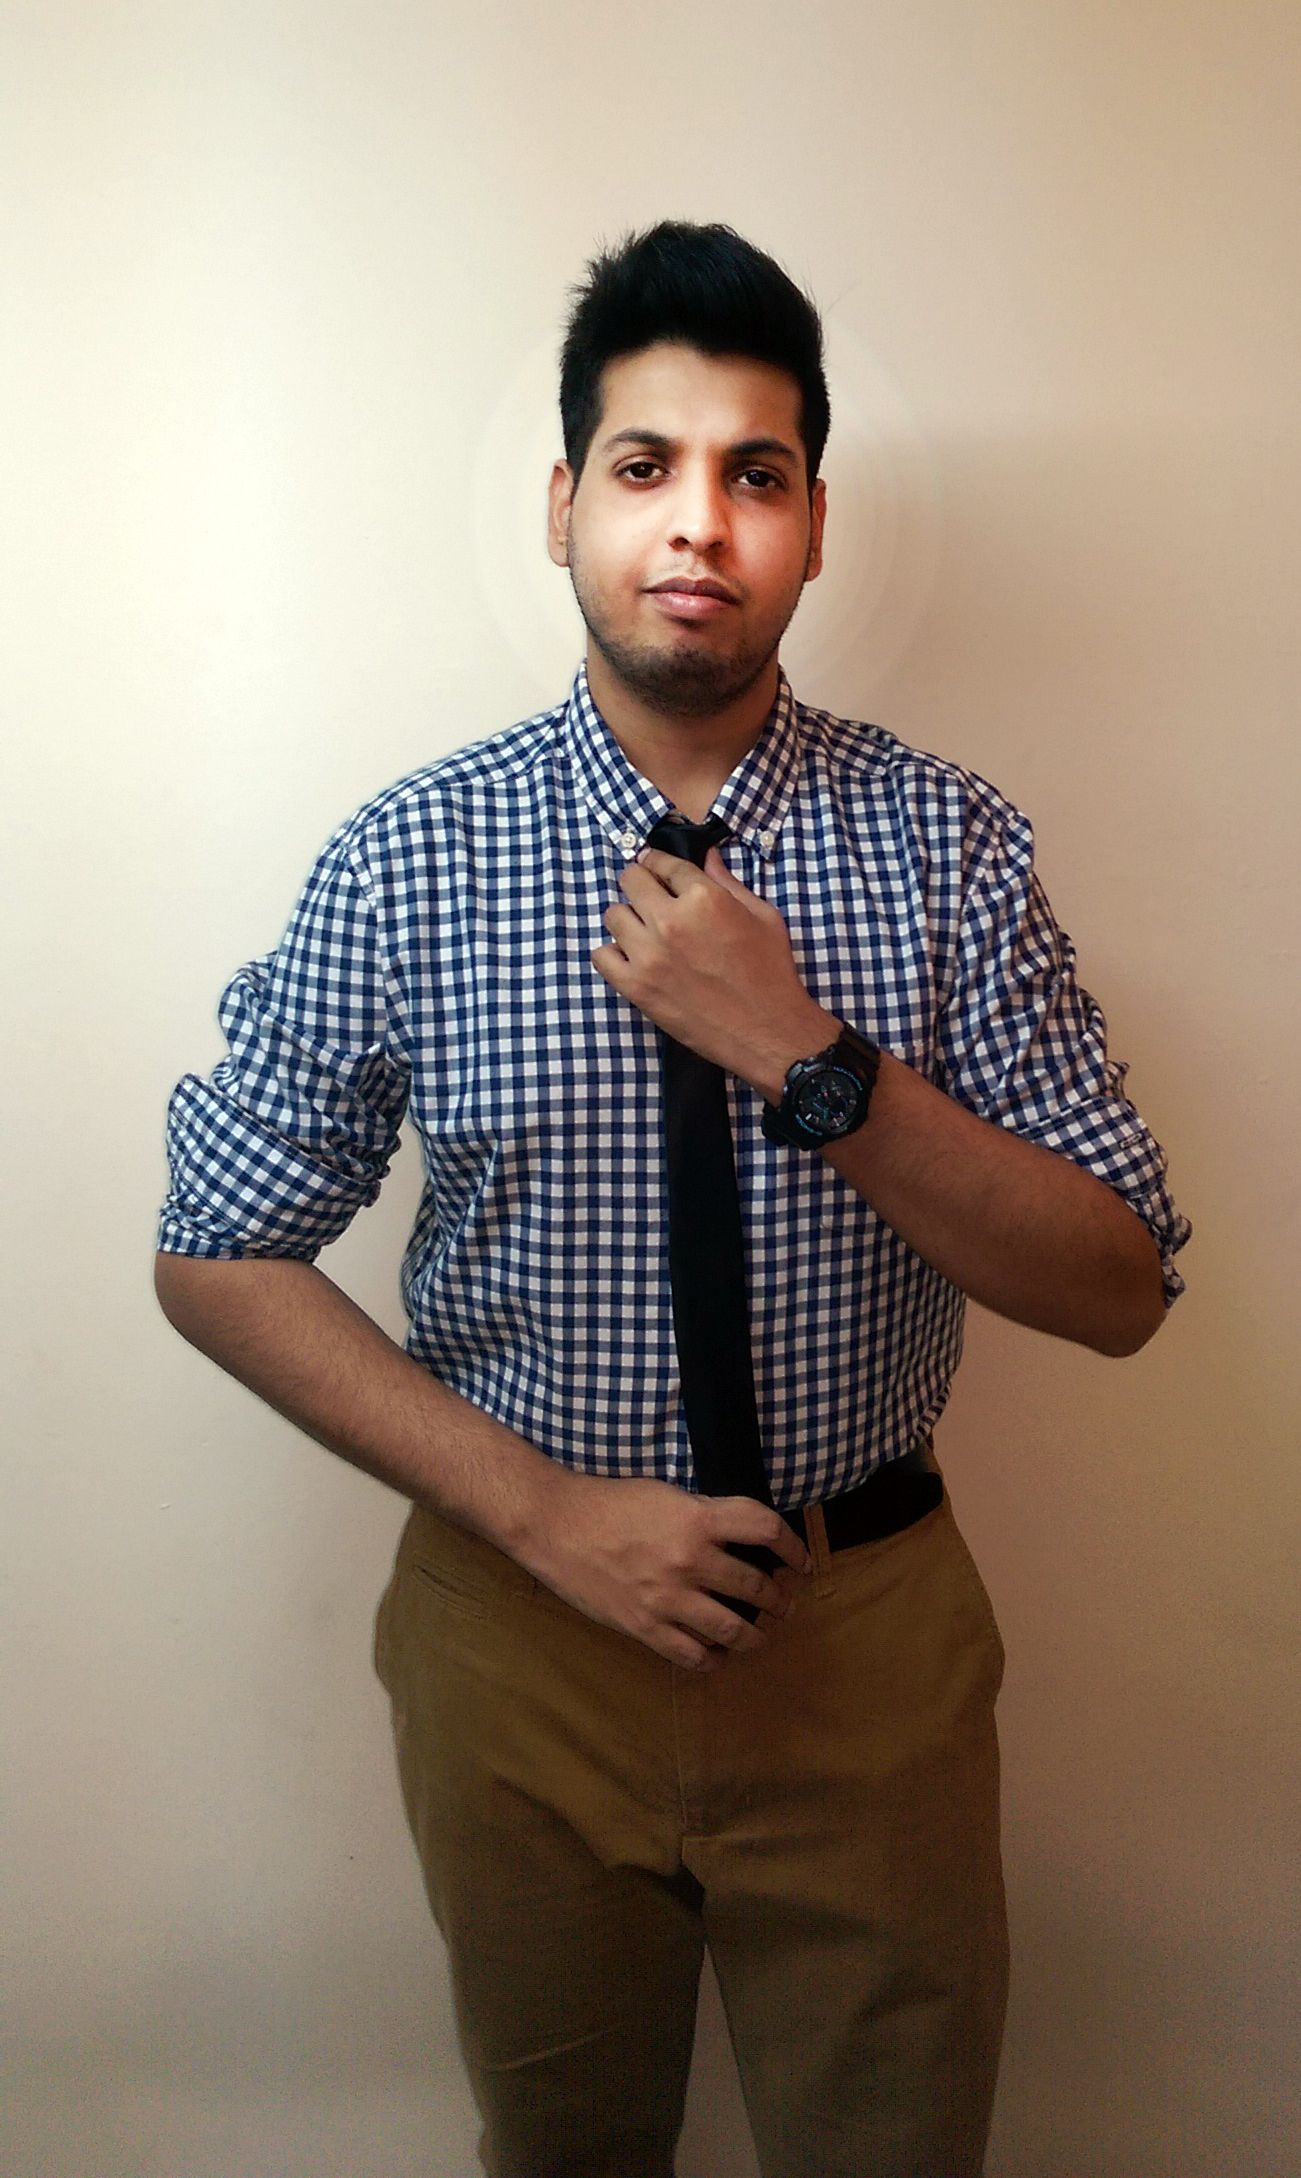 Blue checkered shirt, black tie, black belt, and brown khaki's ...